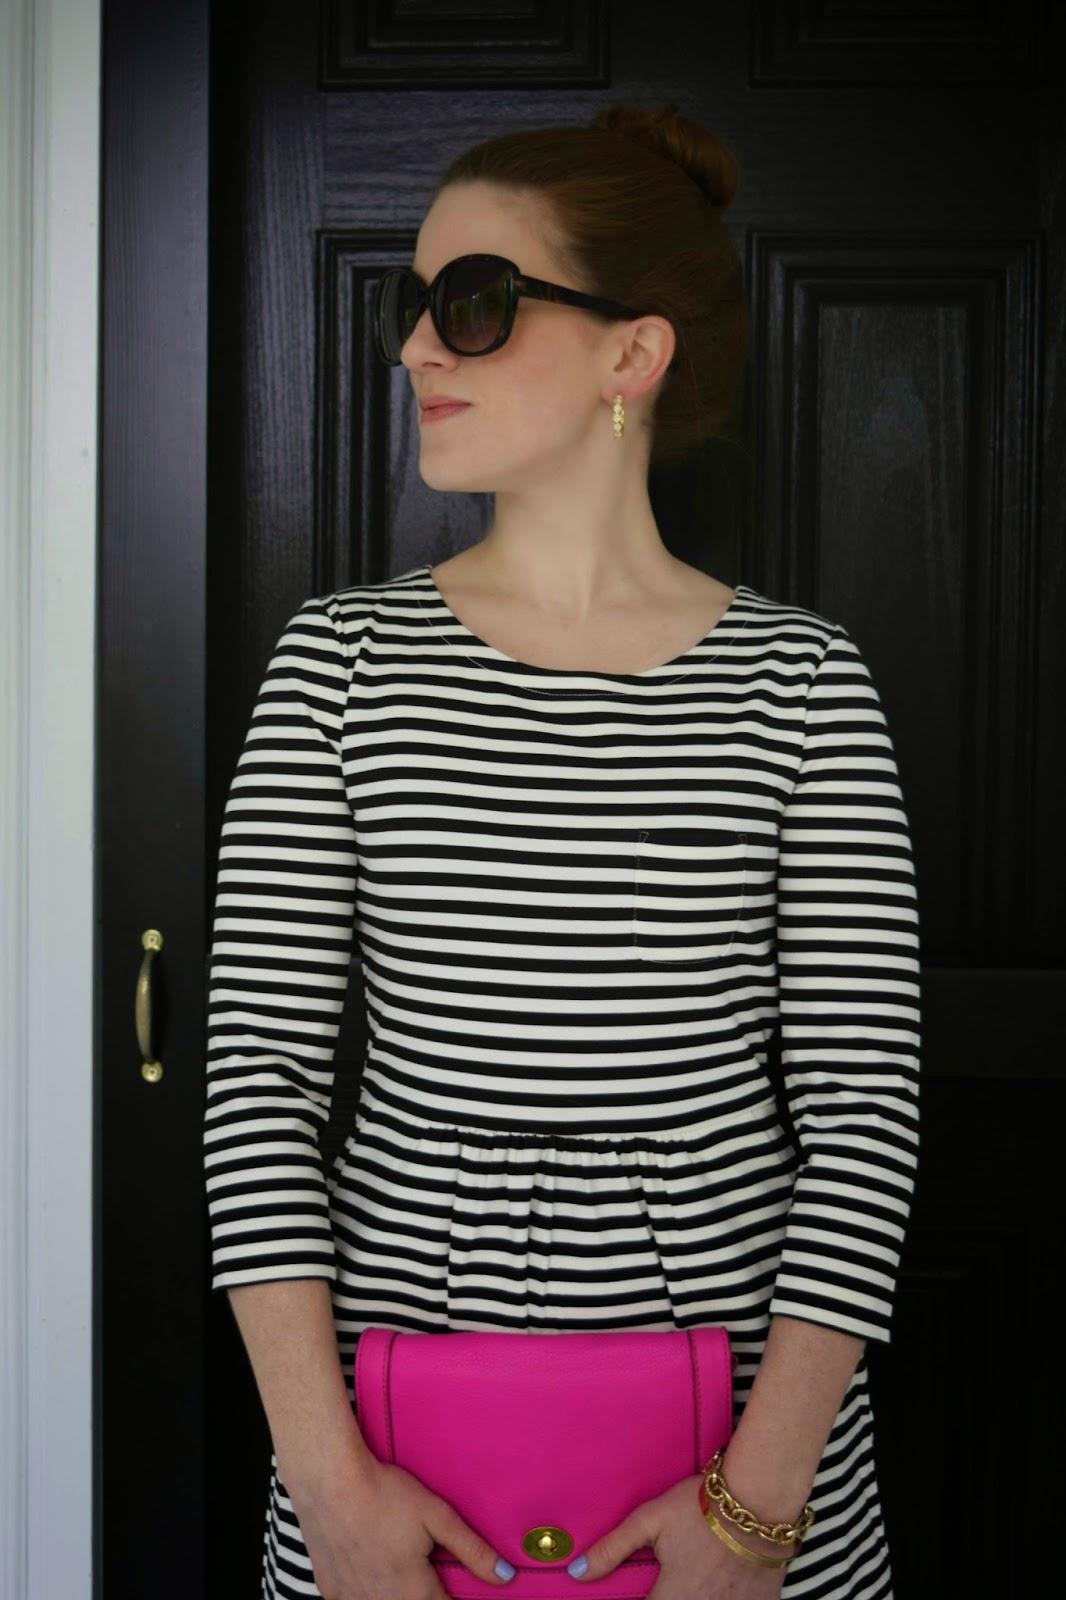 factory pocket dress in stripe - j.crew striped dress - black and white striped dress